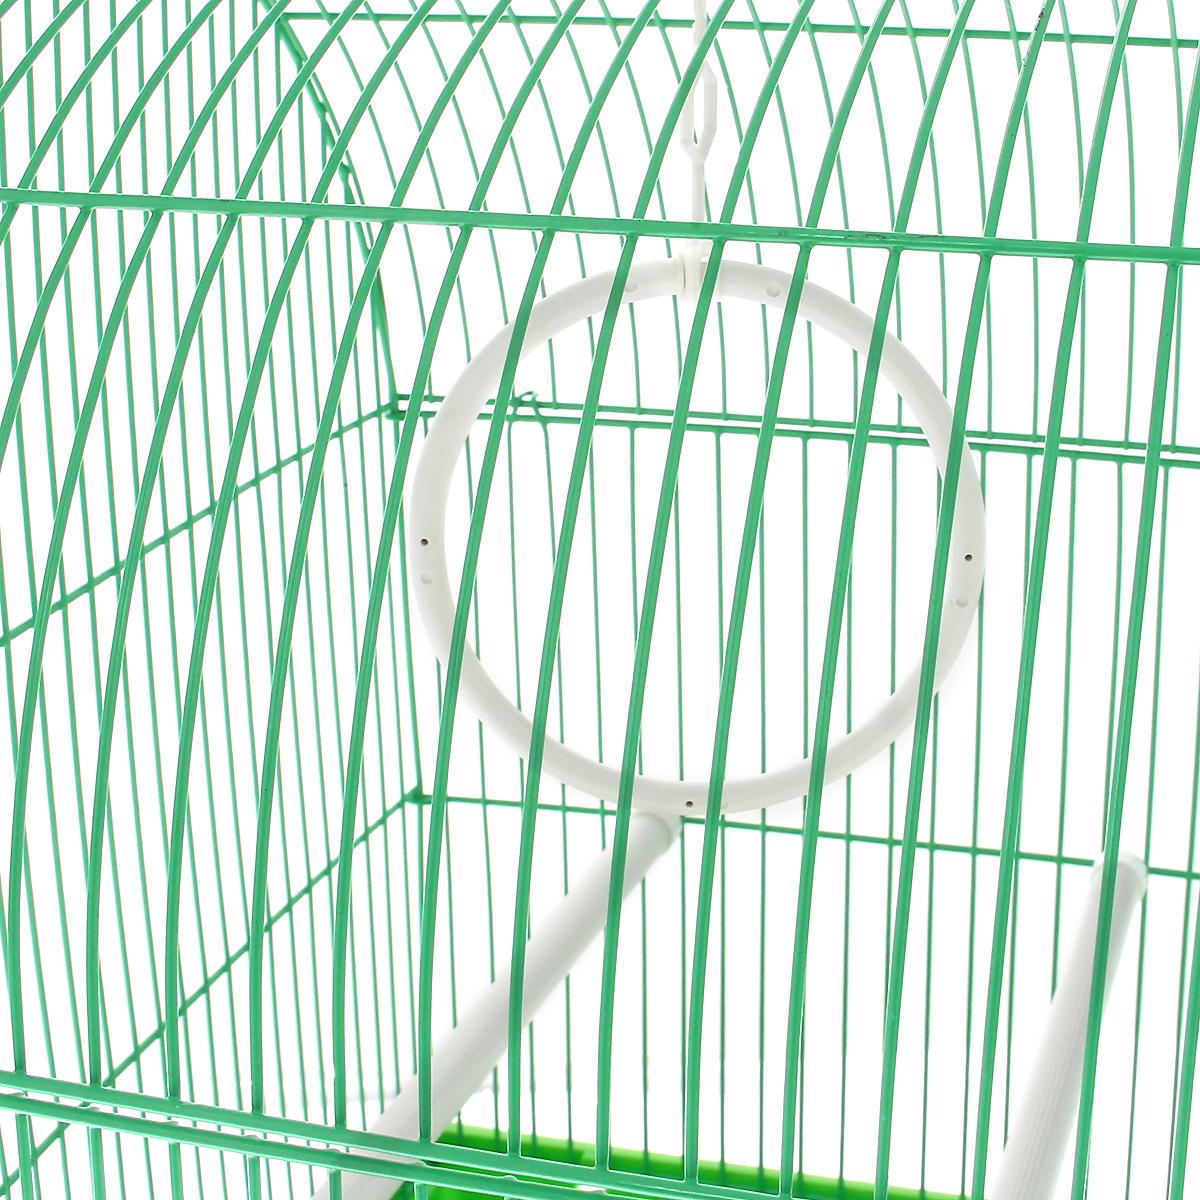 Клетка для птиц, цвет:  зеленый, 35 см х 28 см х 46 см Triol